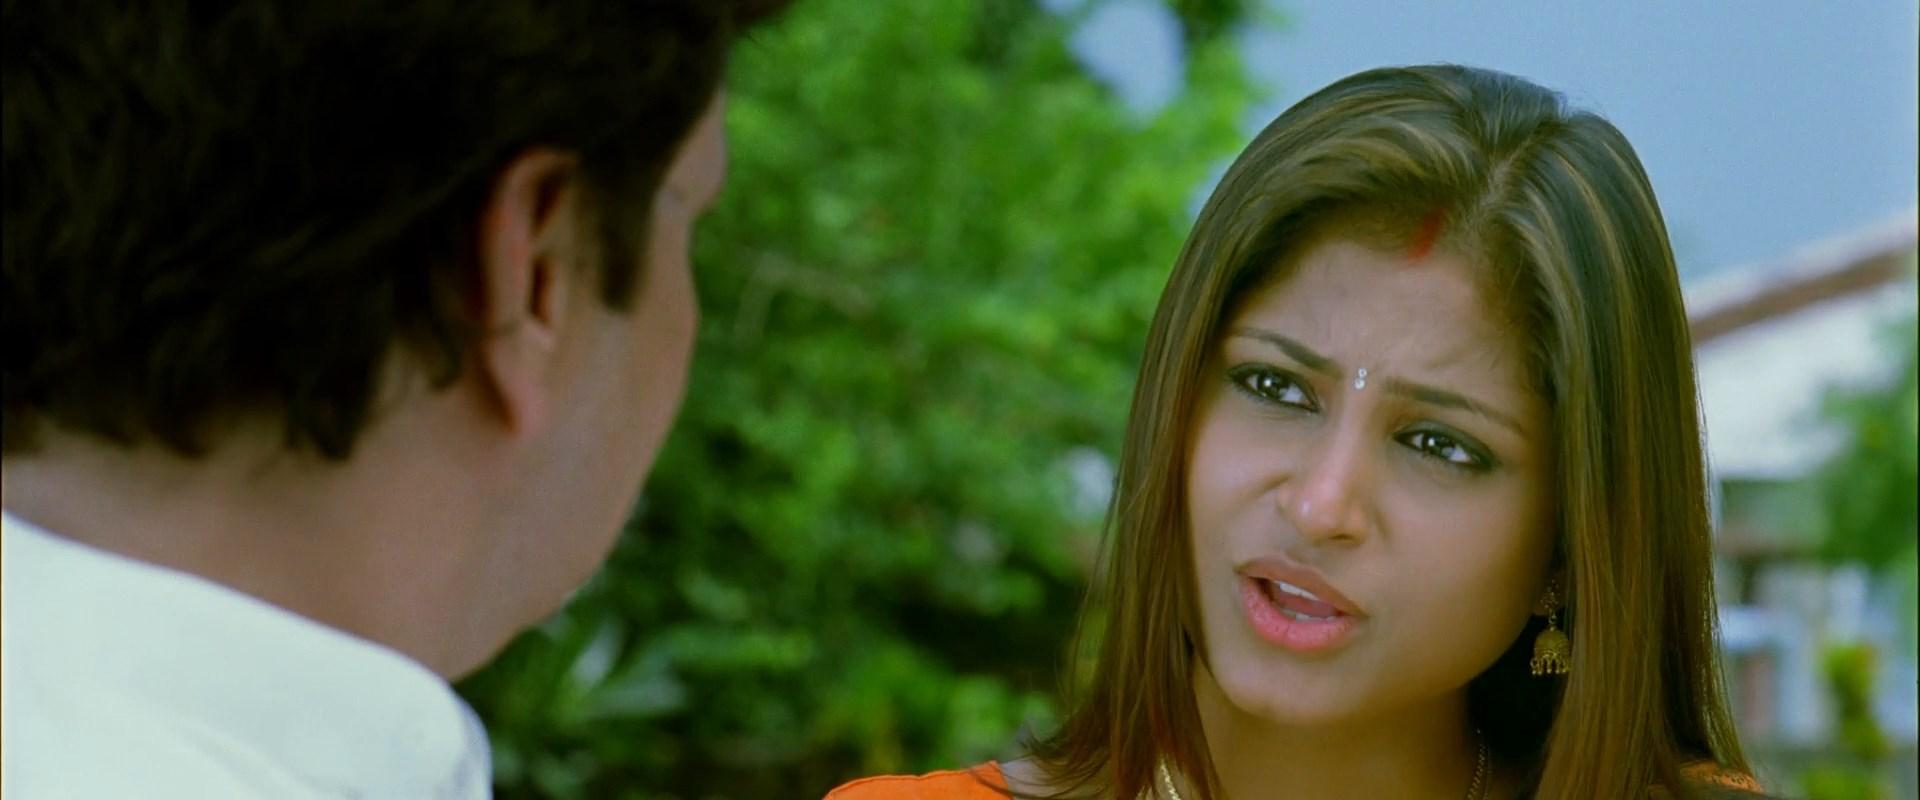 Ami Shubhash Bolchi.2020.Bangali.1080p.WEB DL.H264.AAC.D0T.Telly.mkv snapshot 01.37.30.000